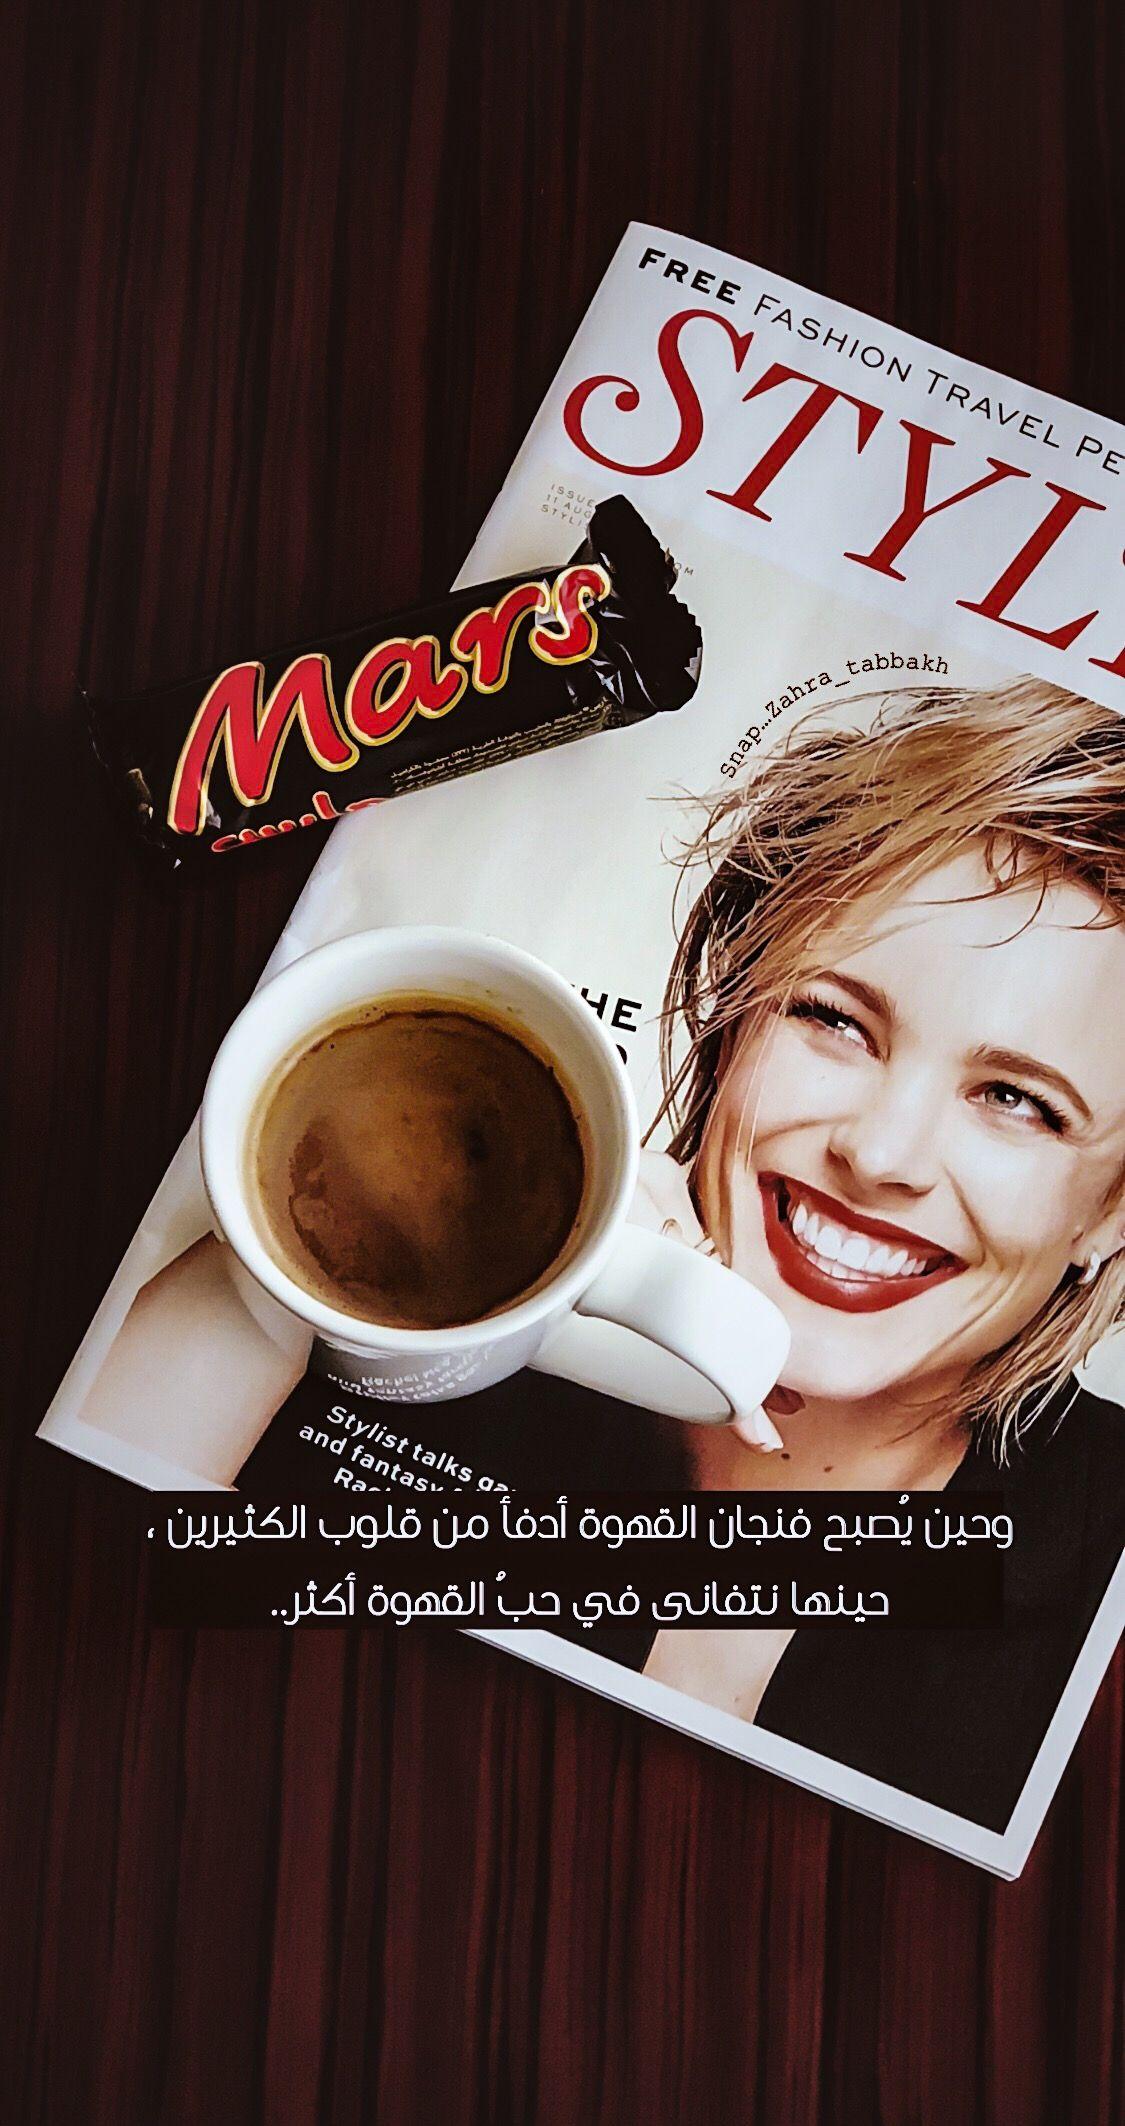 وقت القهوة Inspirational Quotes Arabic Quotes Image